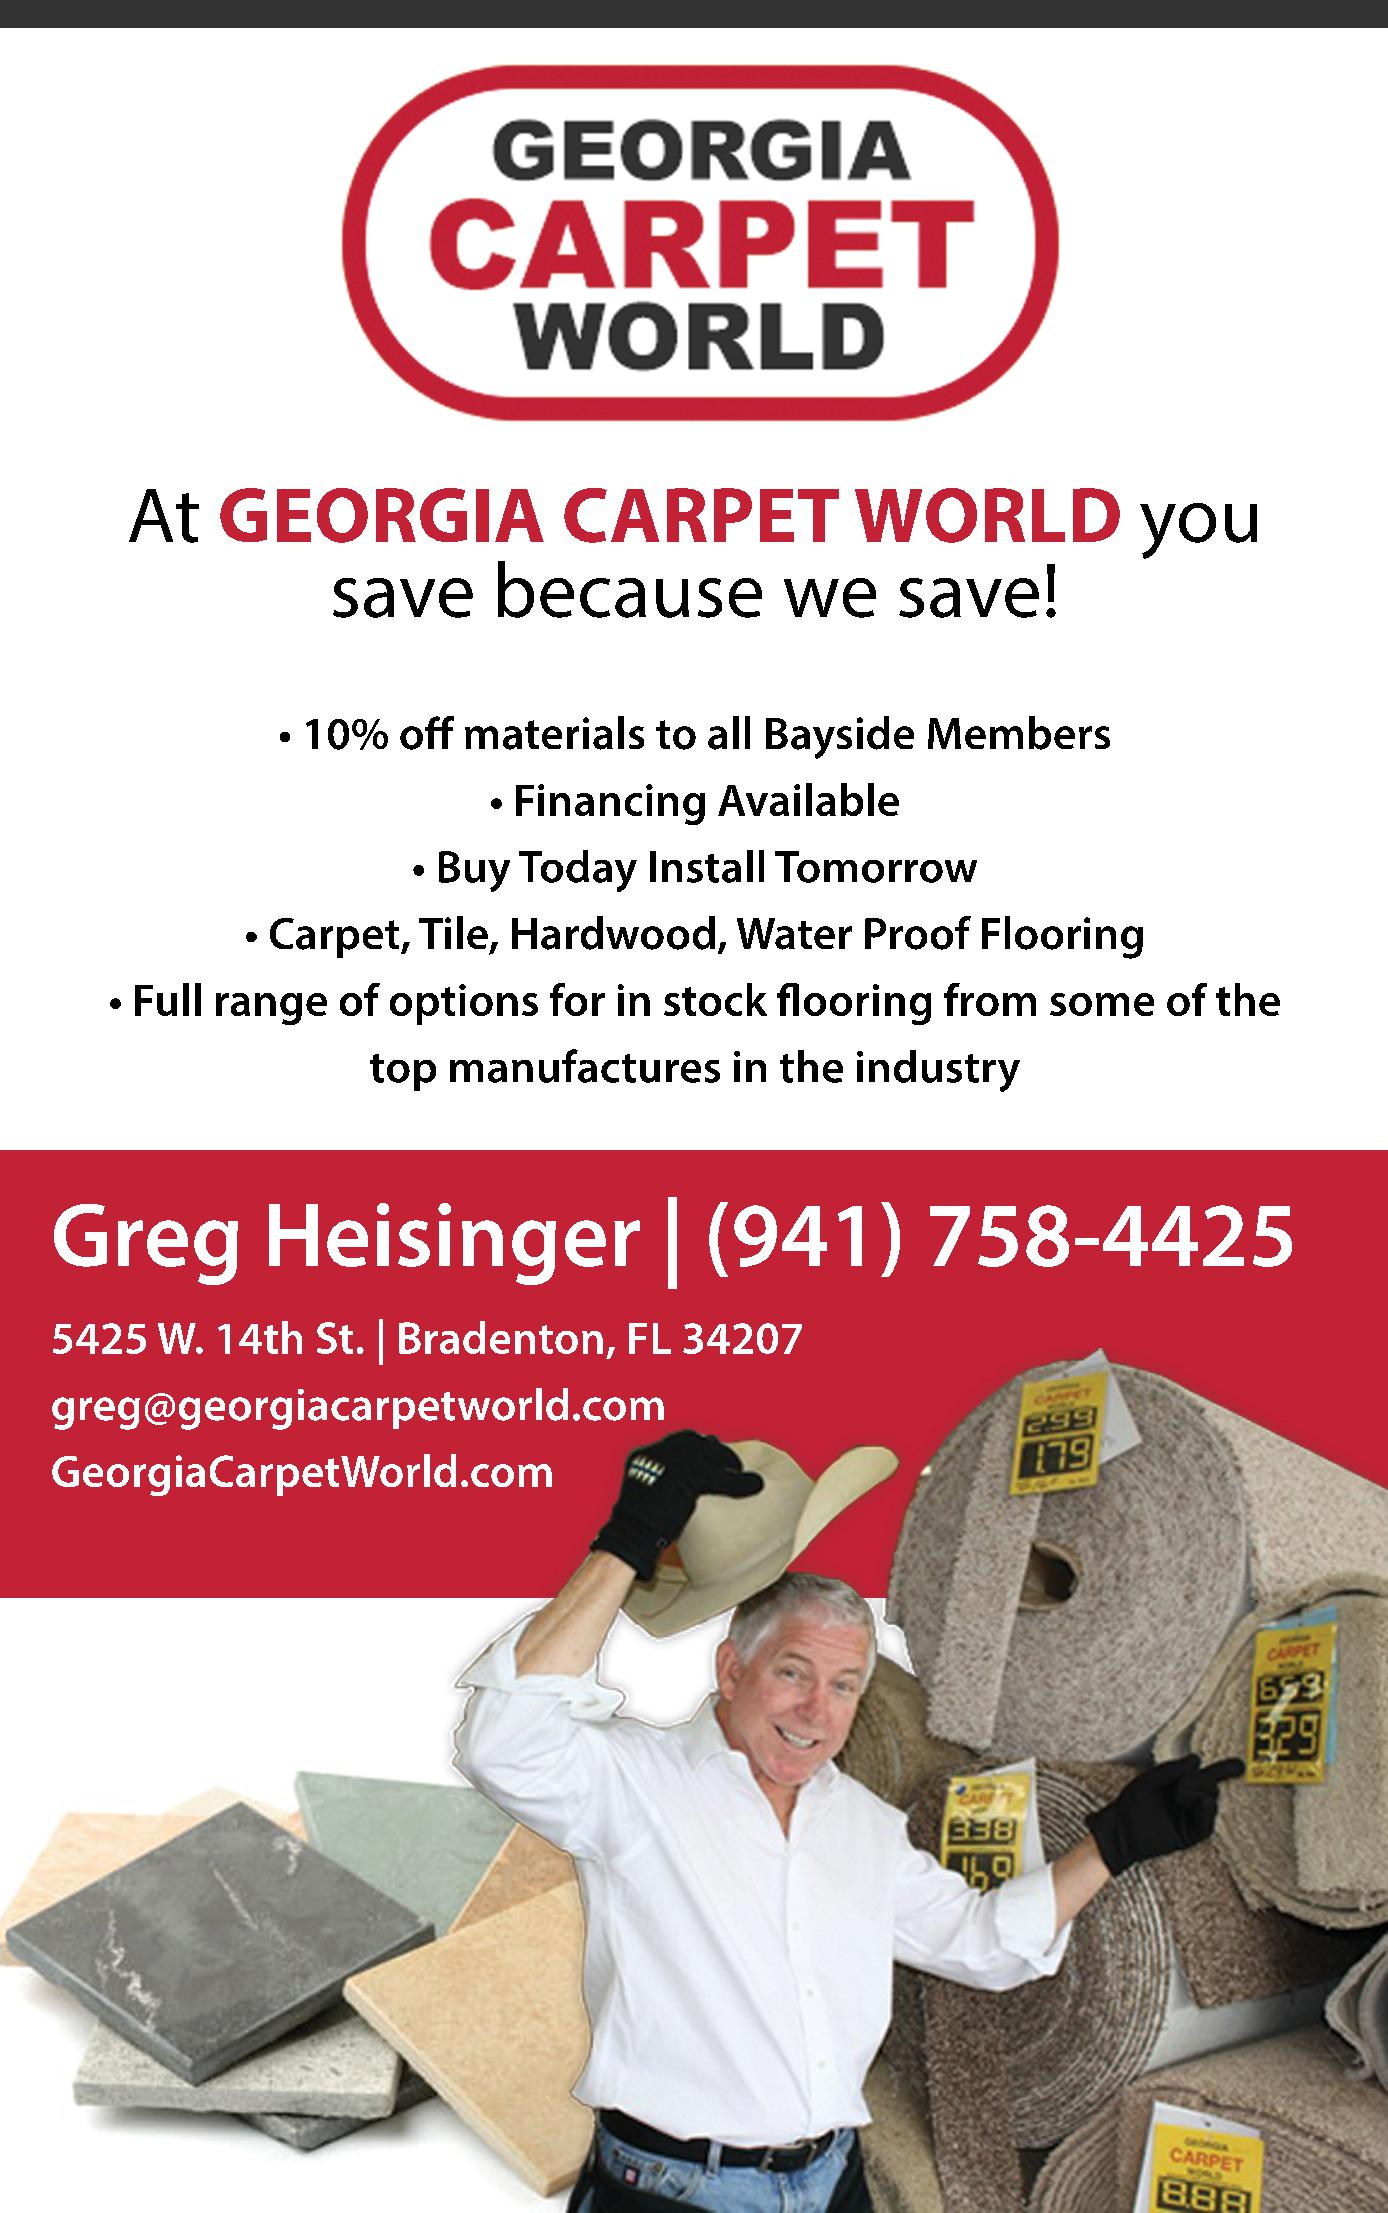 Georgia Carpet World